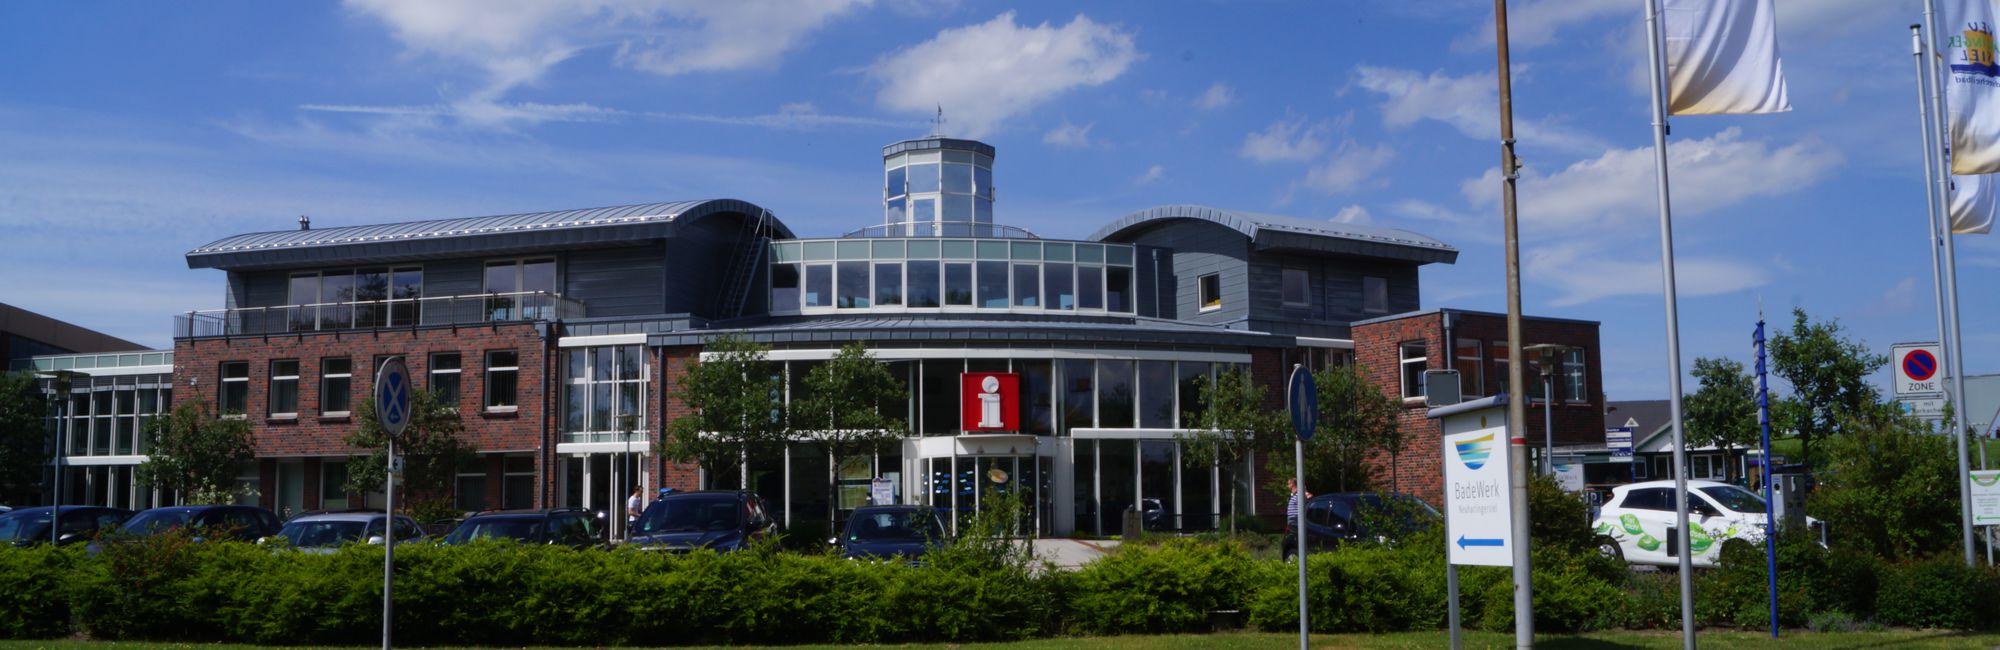 Tourist-Information des Kurverein Neuharlingersiel e.V.